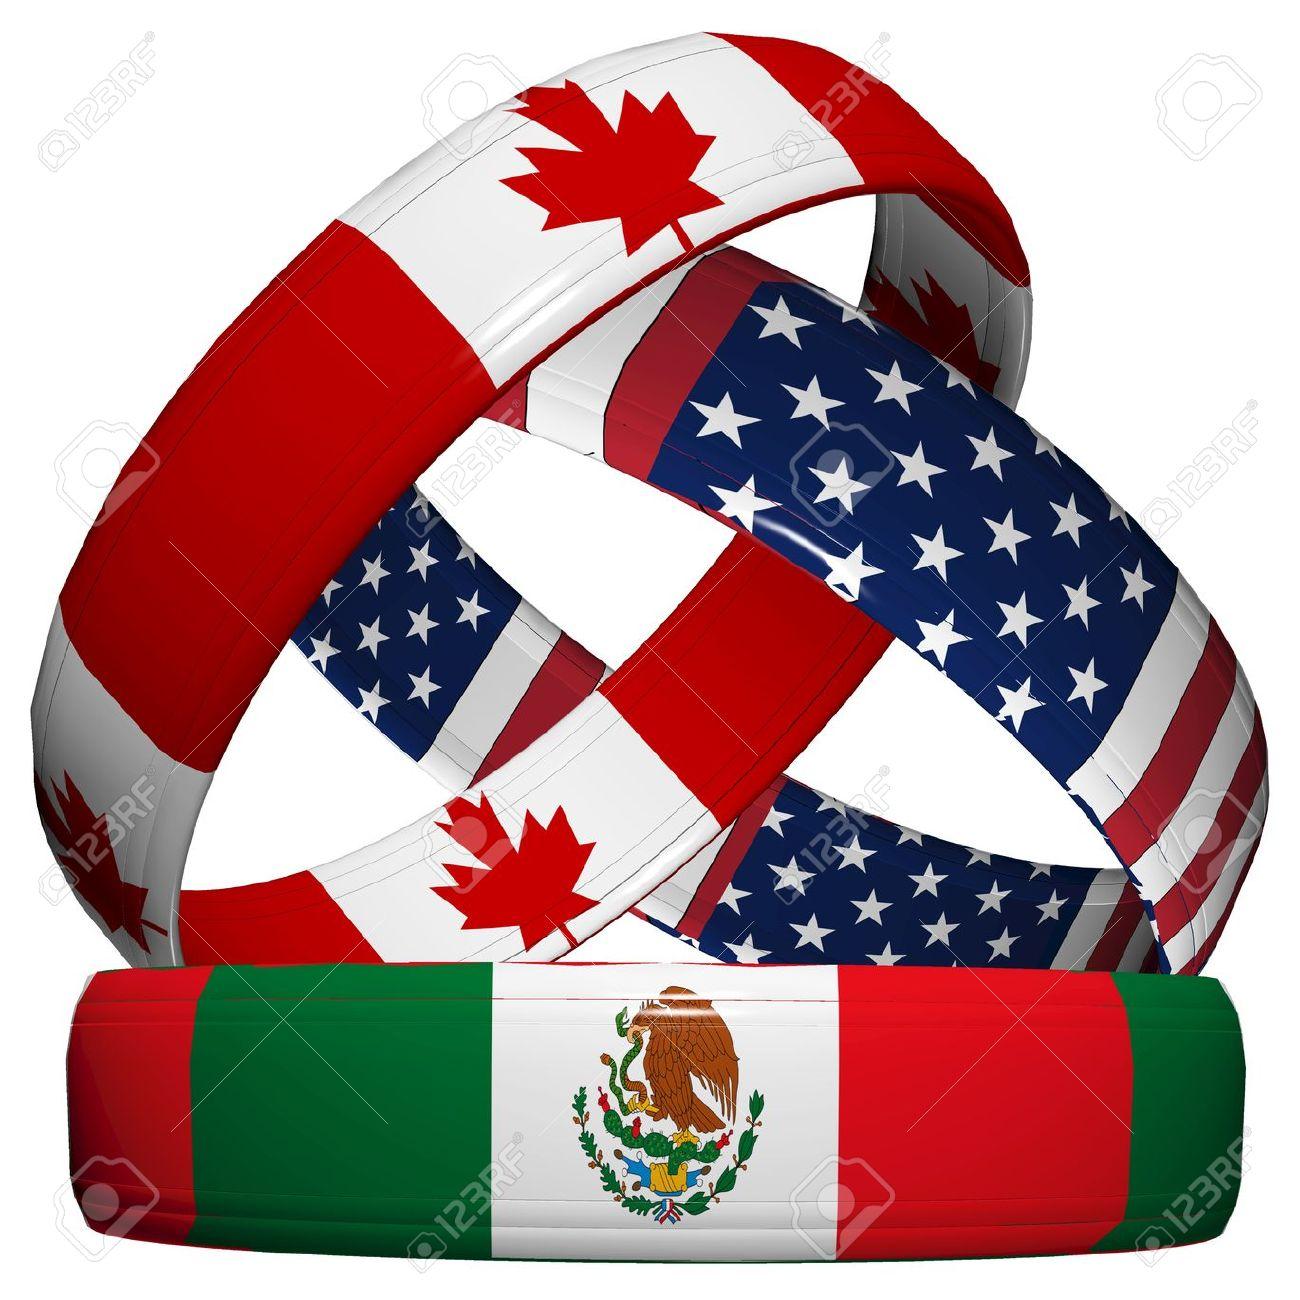 Nafta north american free trade agreement three symbolic wedding nafta north american free trade agreement three symbolic wedding rings in the national flag platinumwayz